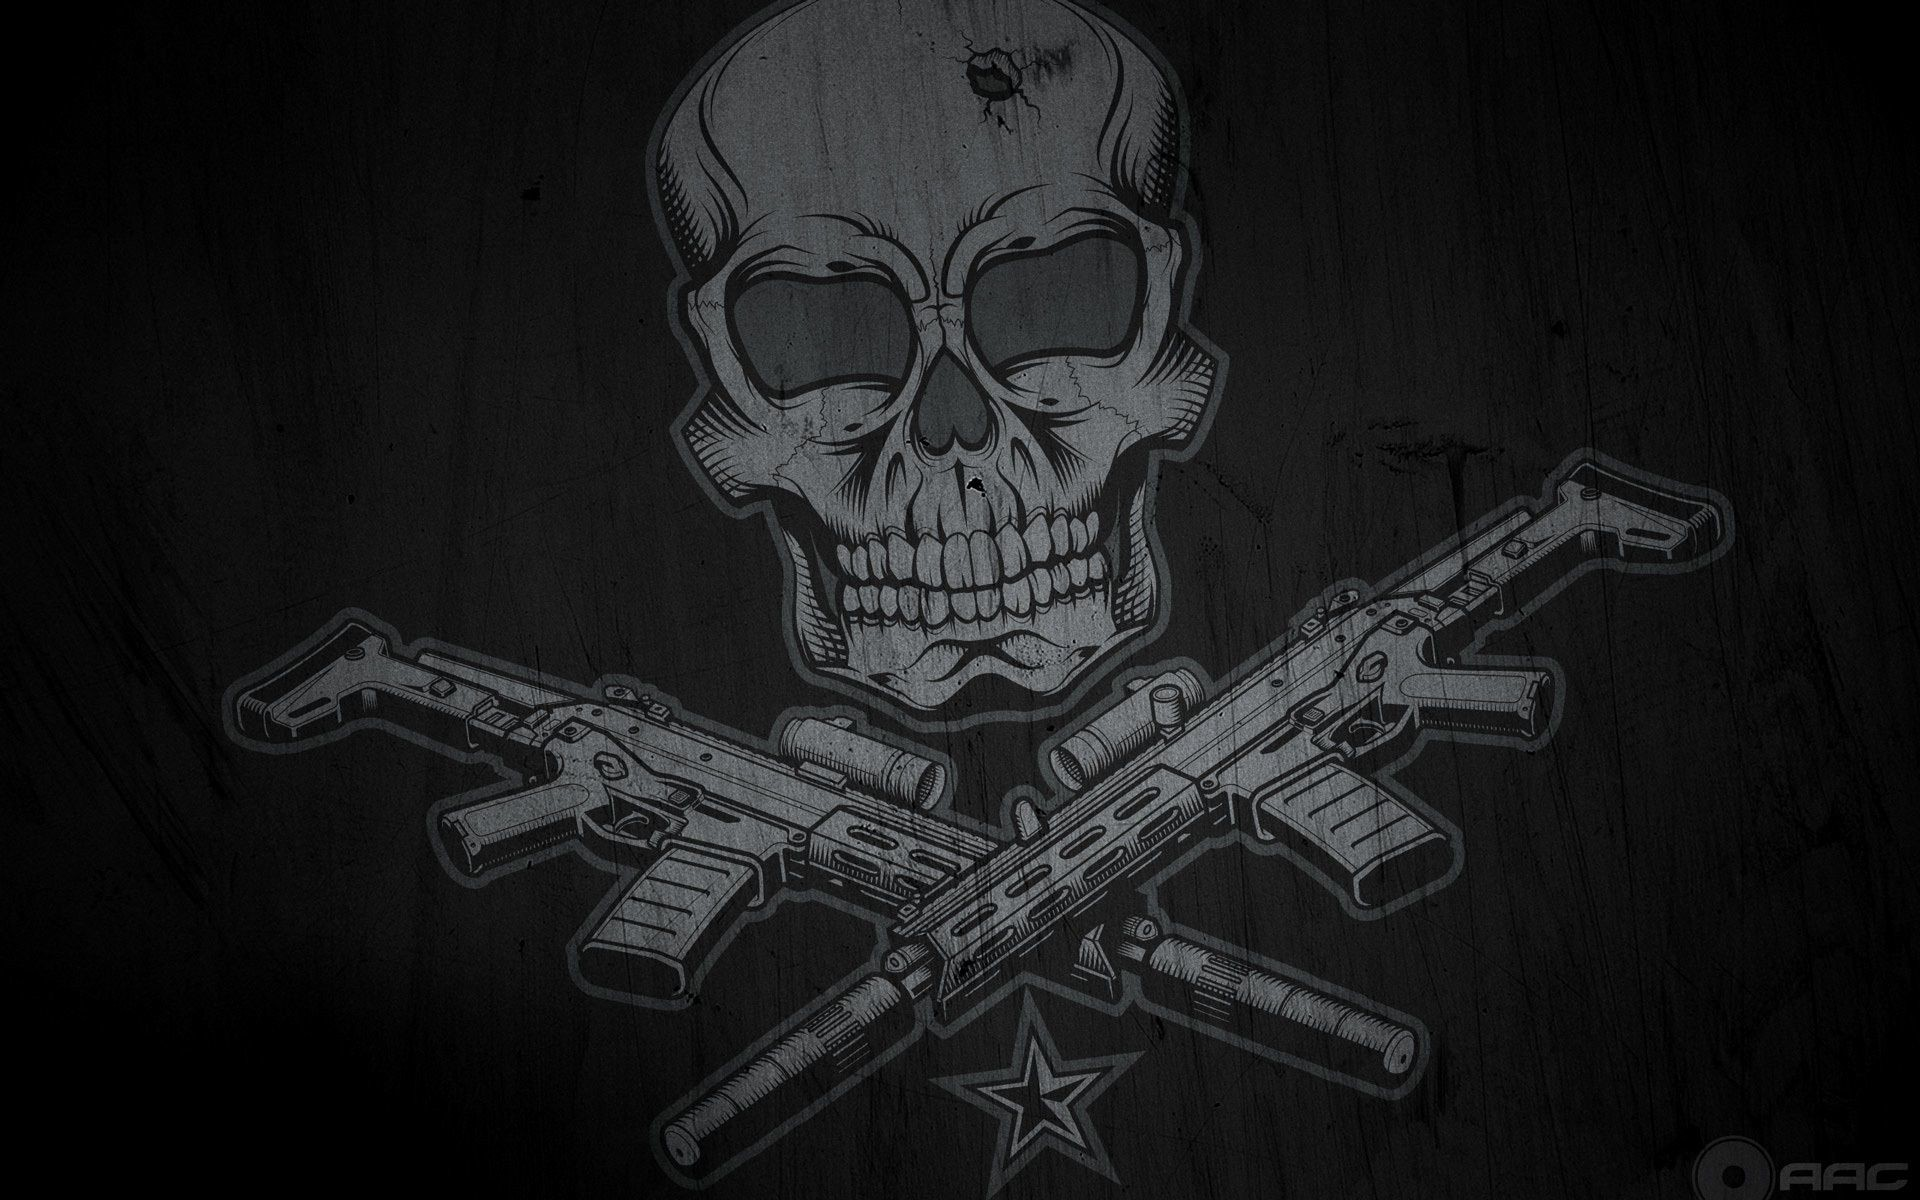 Skulls And Guns Wallpaper